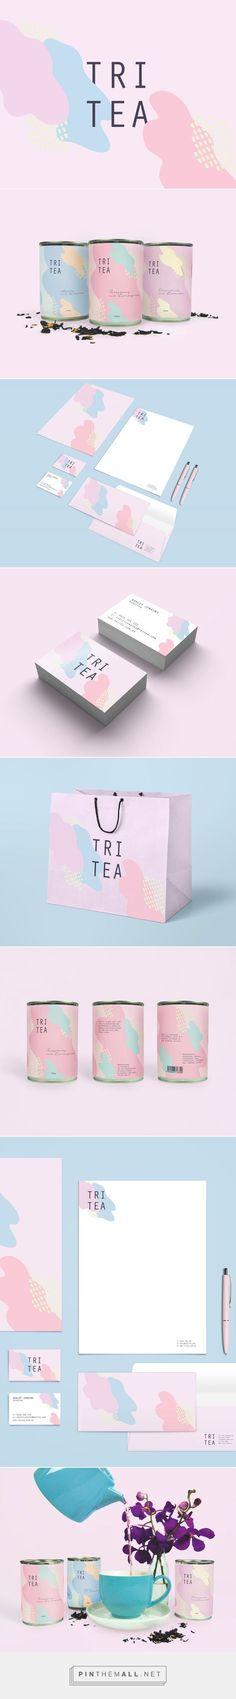 Tri Tea Branding and Packaging by Nasia Syrakis Web Design Agency, Graphic Design Branding, Identity Design, Brand Identity, Label Design, Tea Packaging, Brand Packaging, Packaging Design, Corporate Design